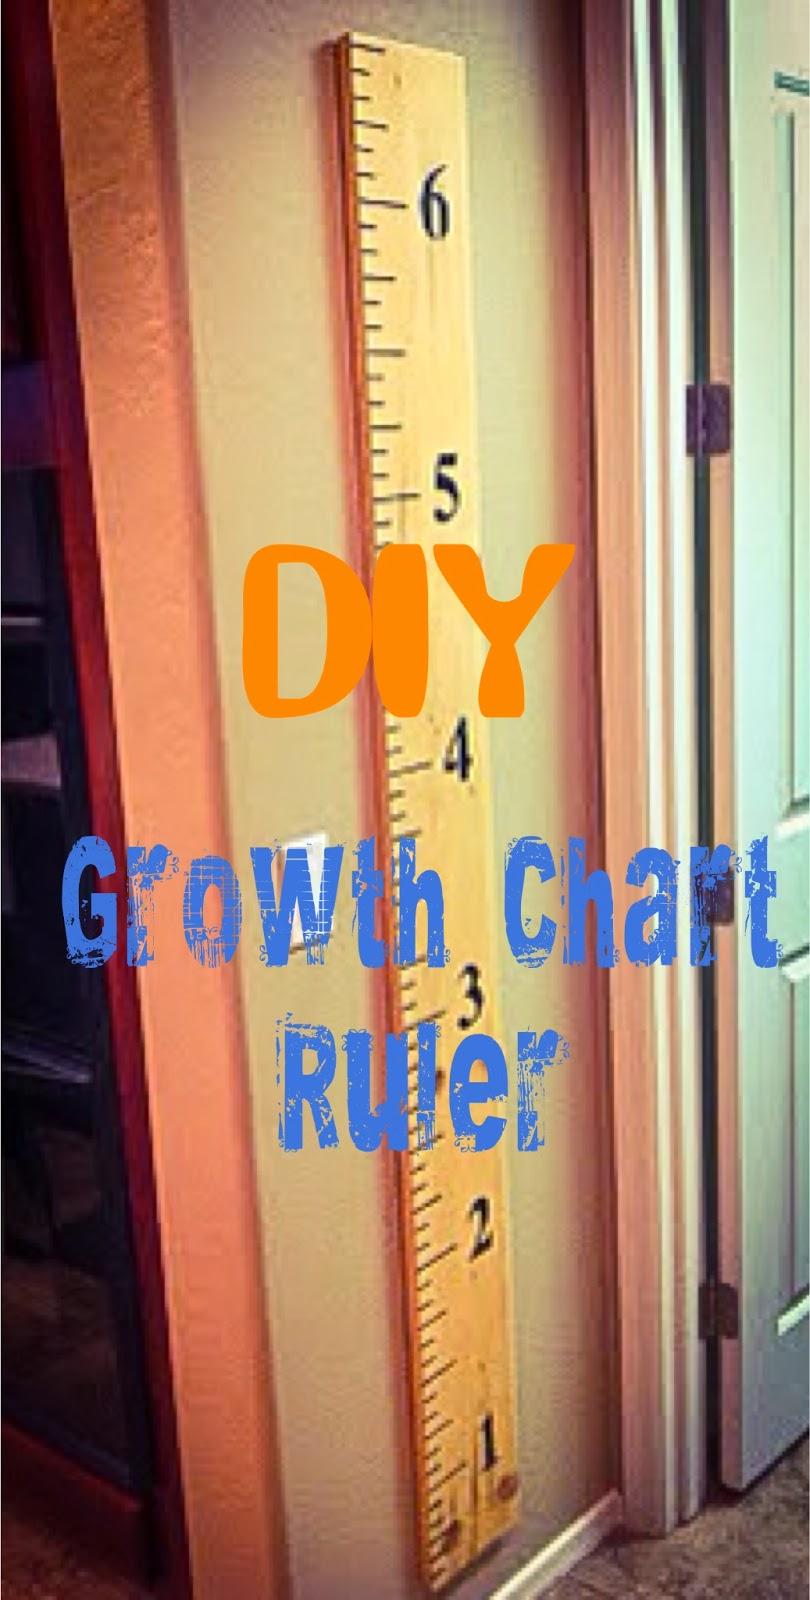 Alohamora open a book diy growth chart ruler nvjuhfo Gallery